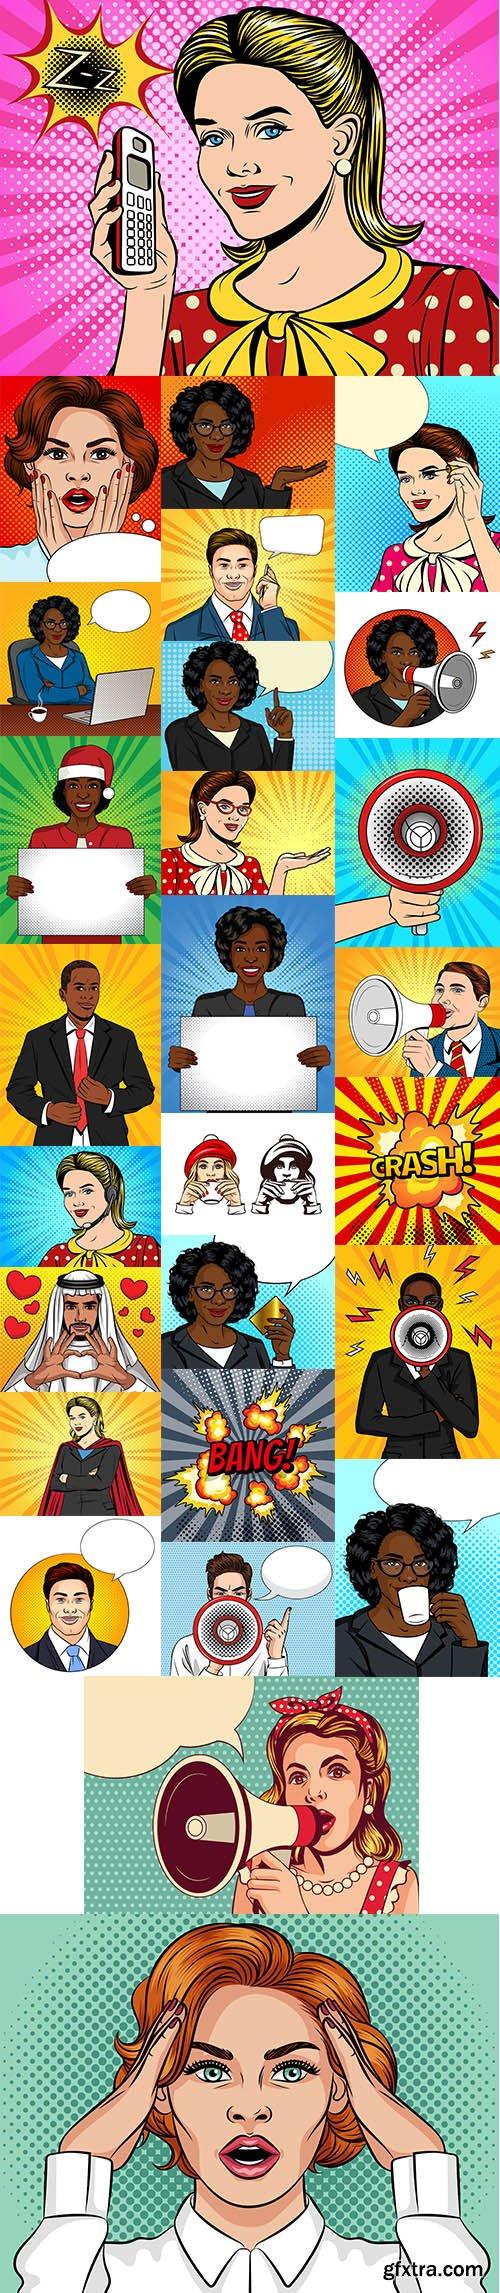 Pop Art Comic Style People Illustration